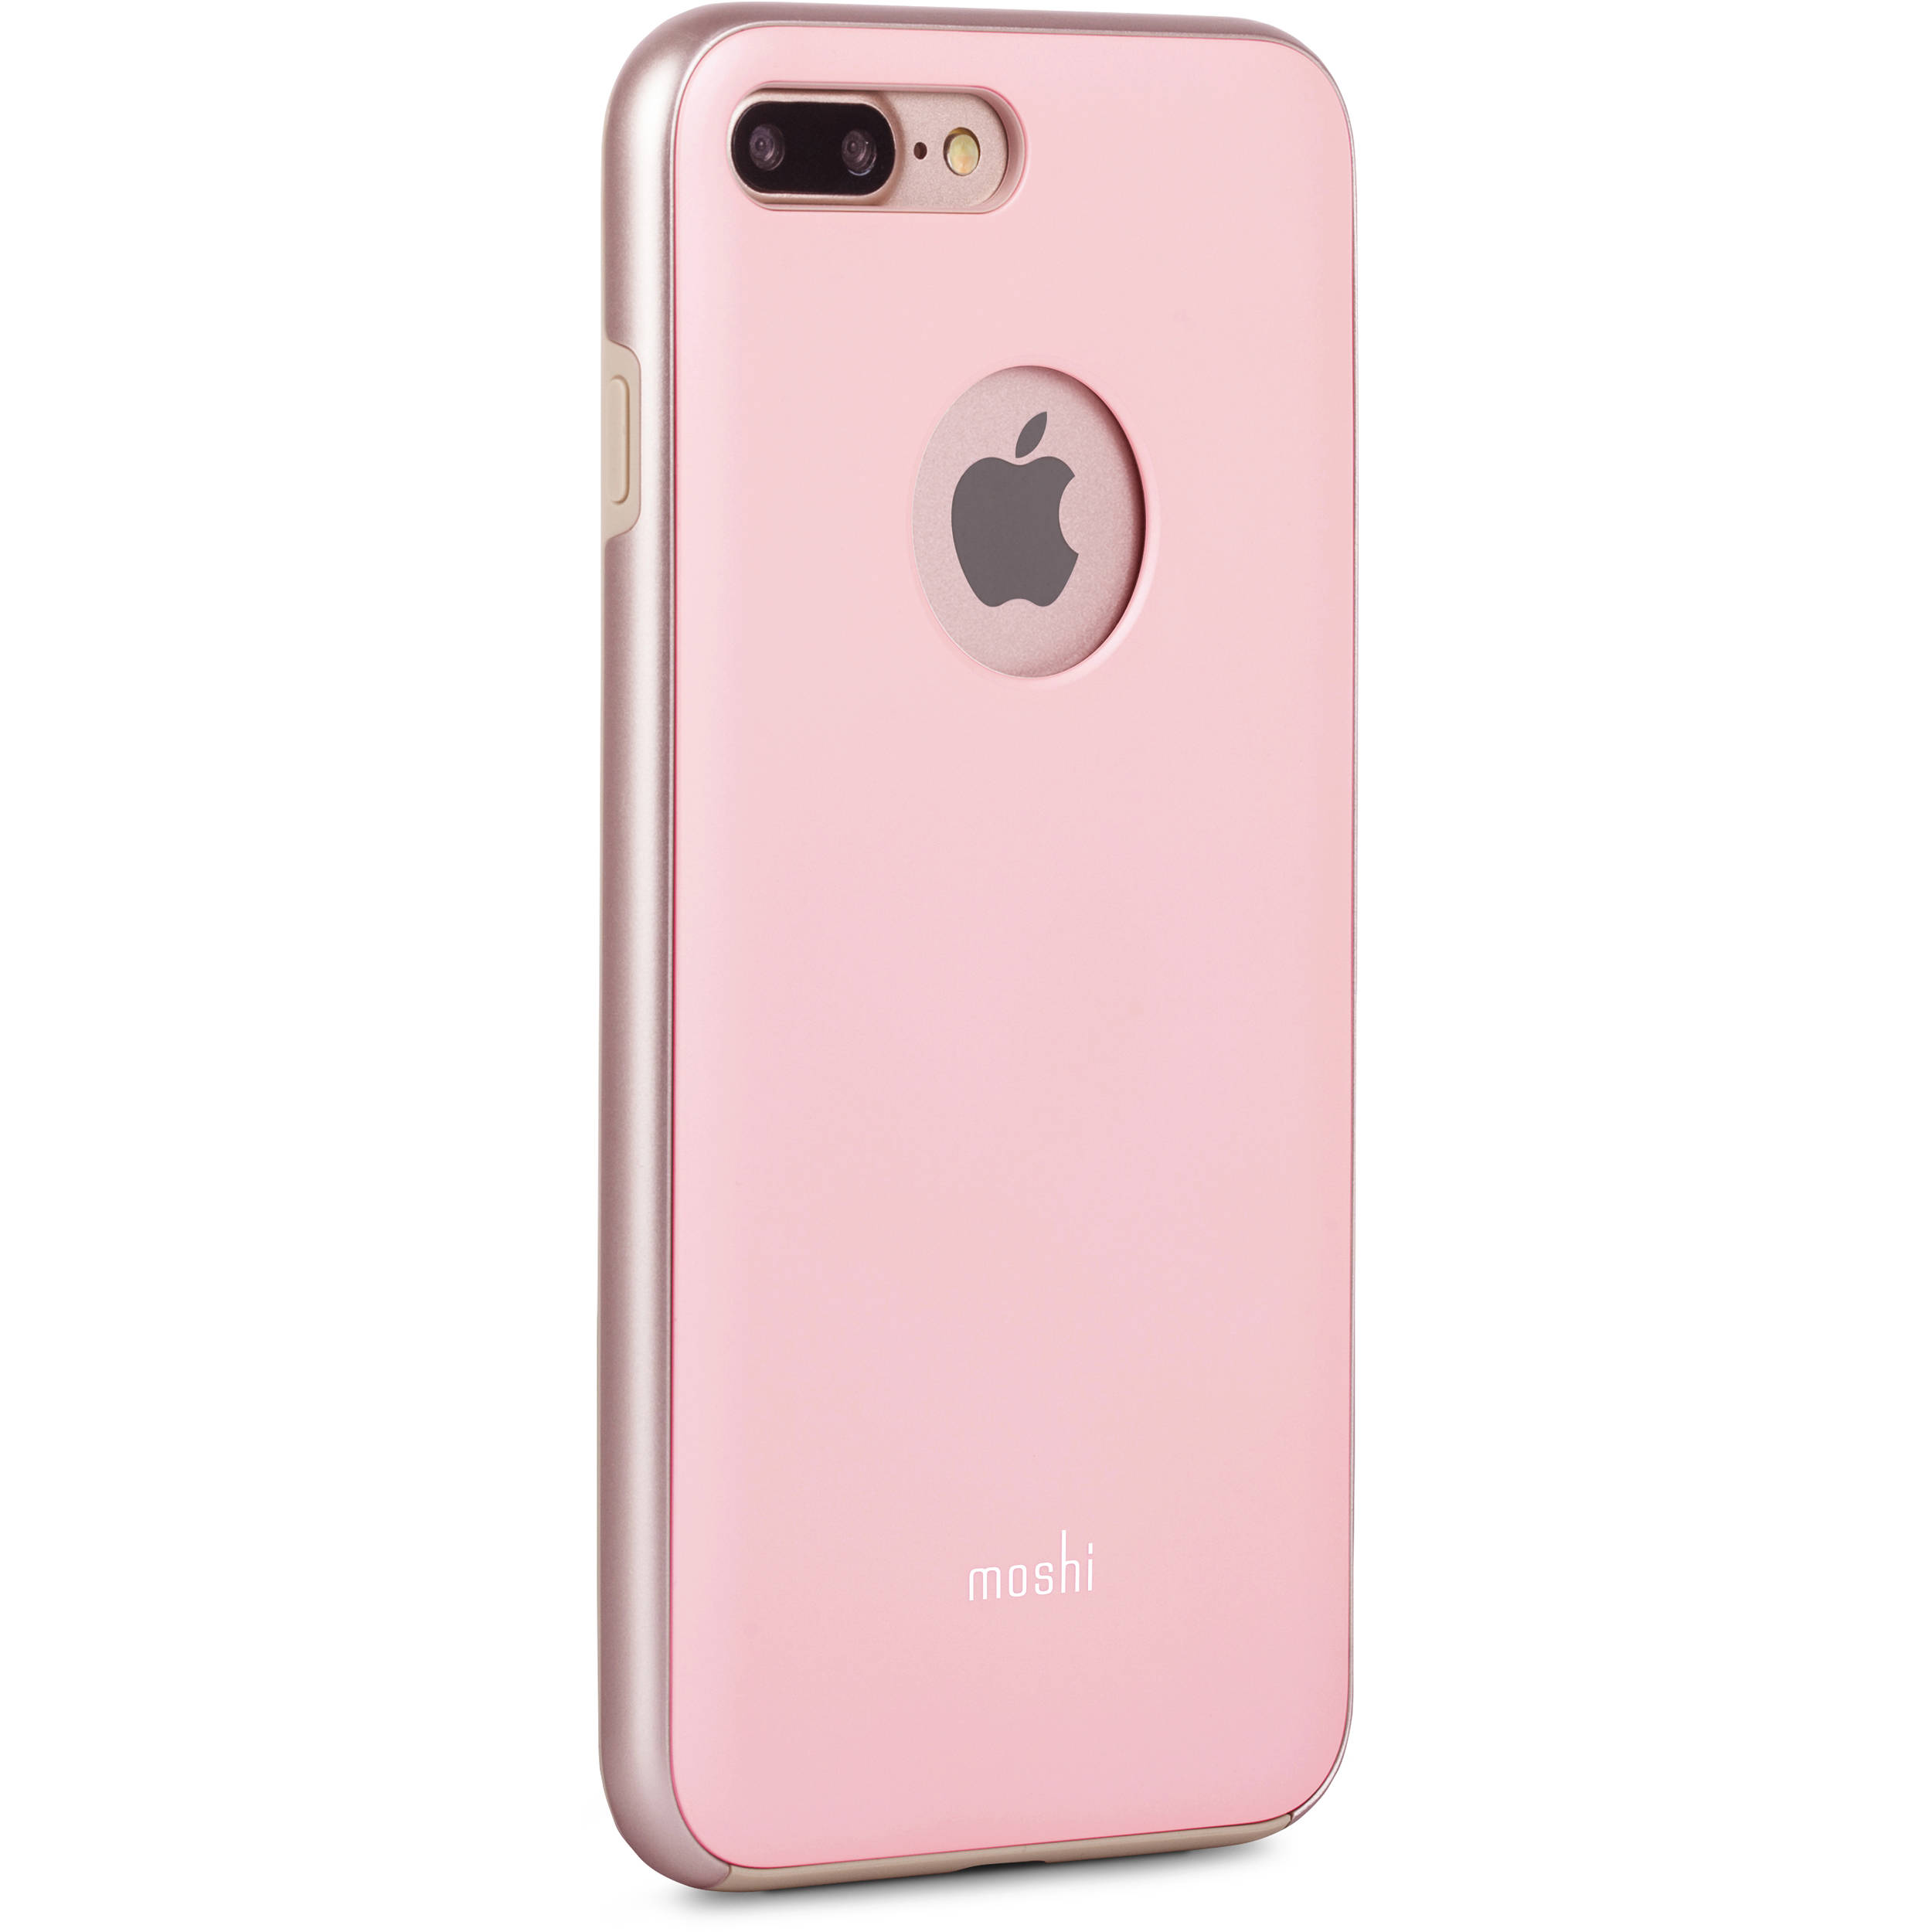 moshi iglaze case for iphone 7 plus pink 99mo090301 b h photo. Black Bedroom Furniture Sets. Home Design Ideas